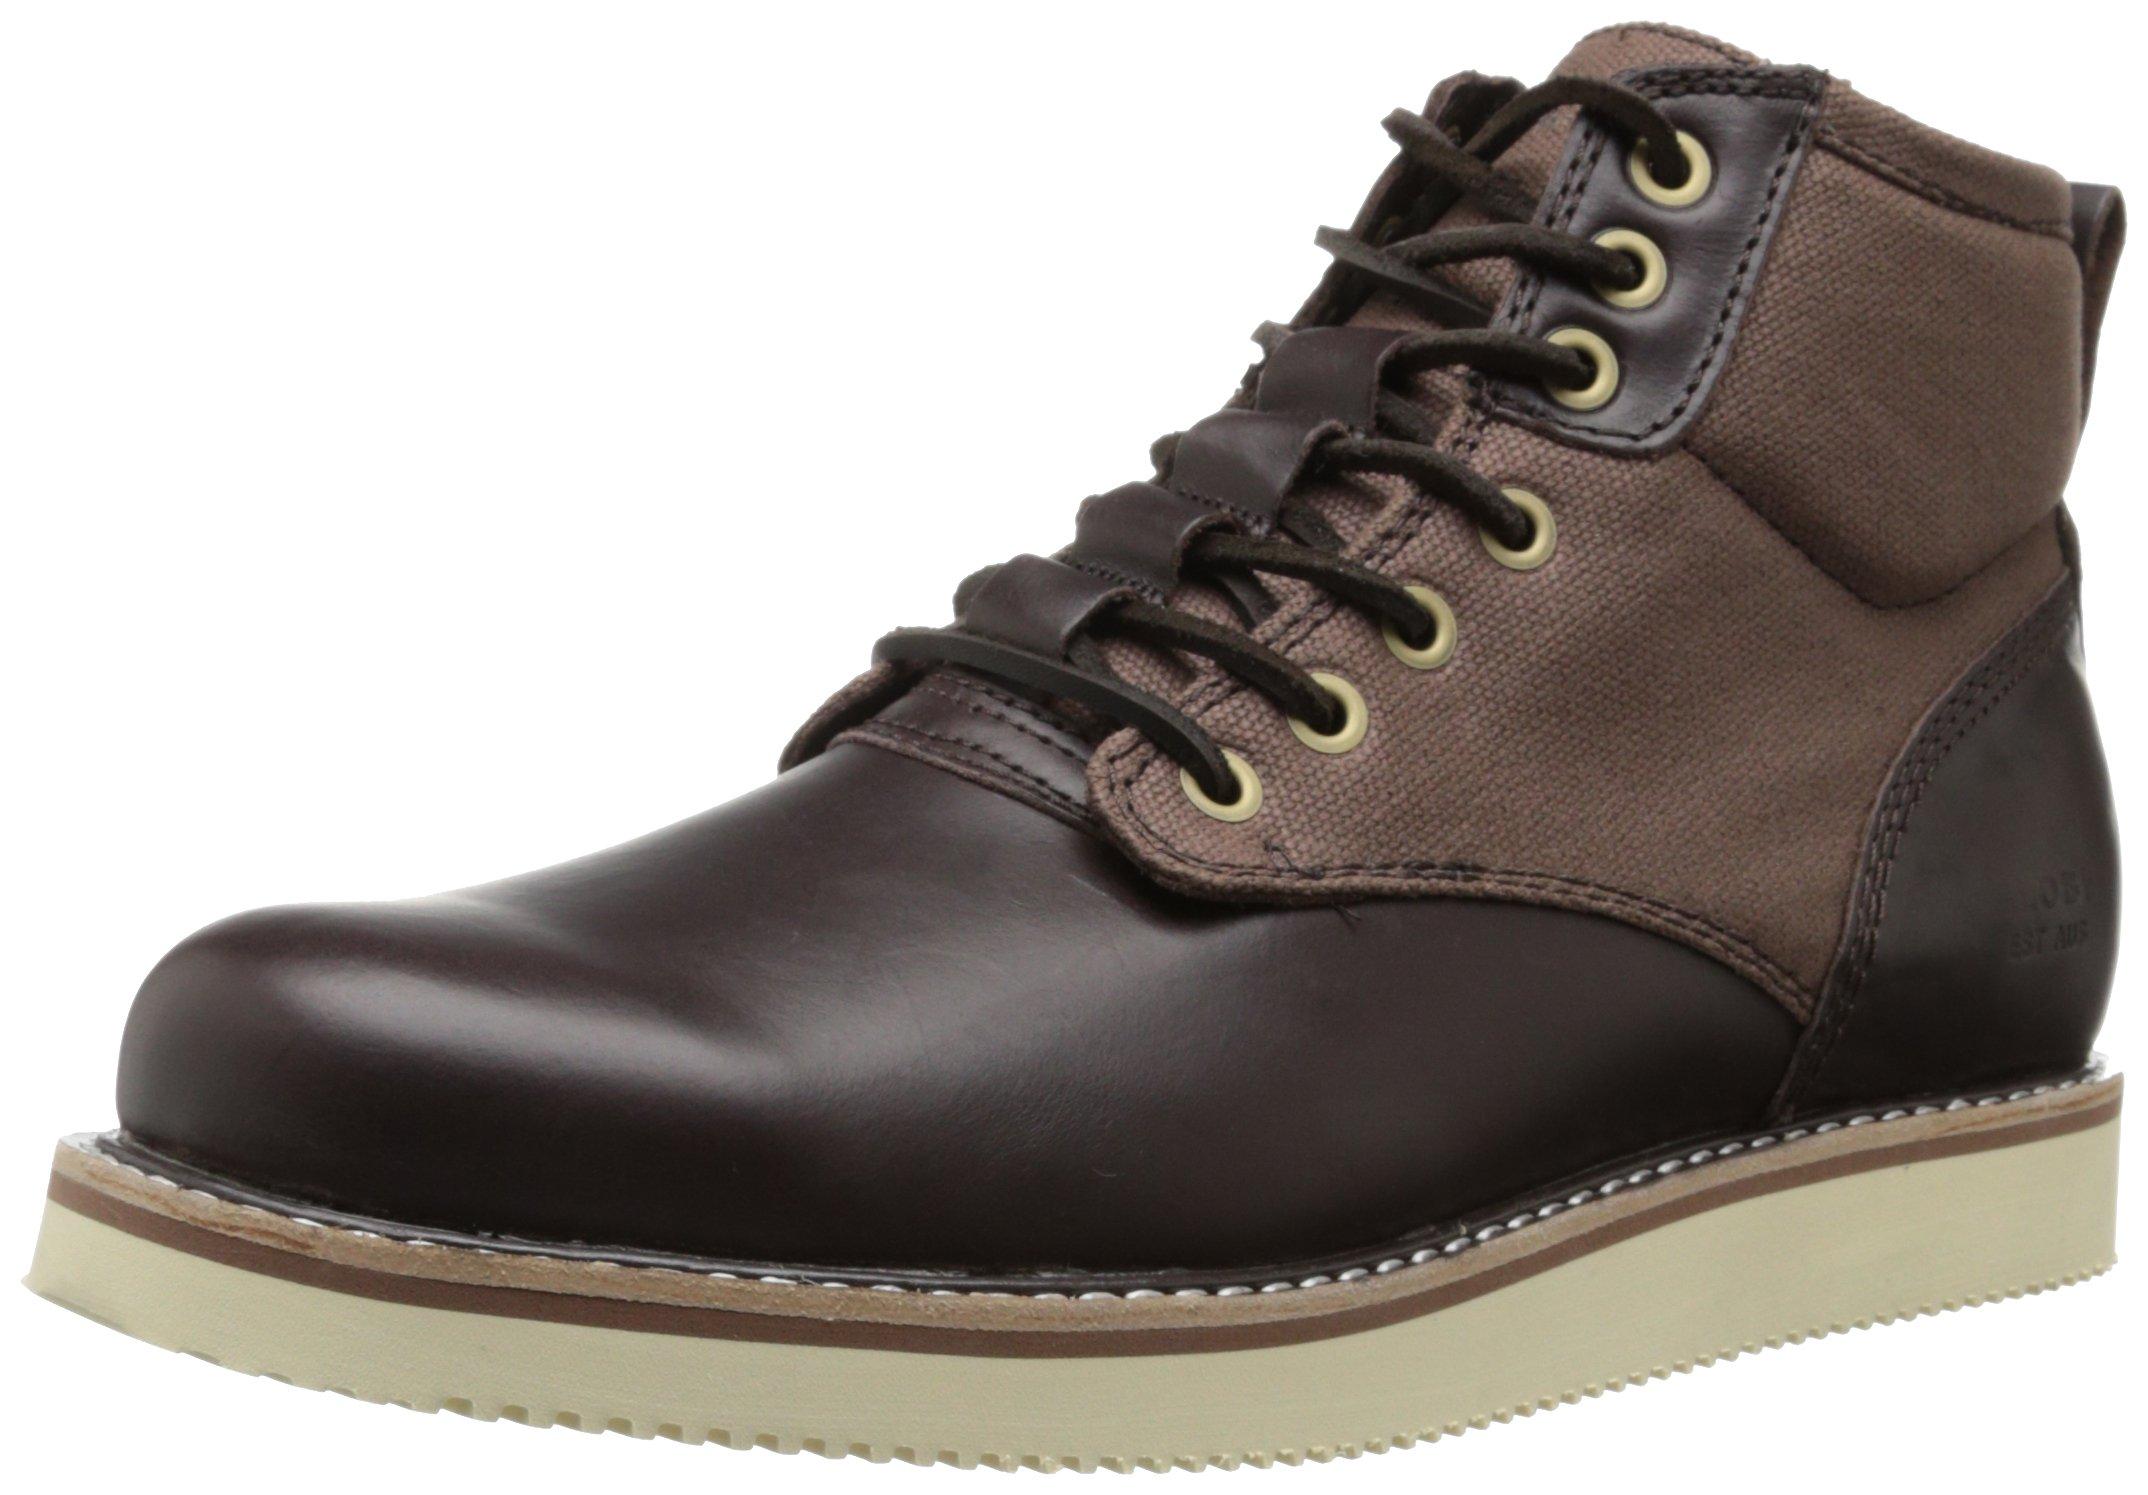 Globe Men's Nomad Boot Sneaker,Brown,8 M US